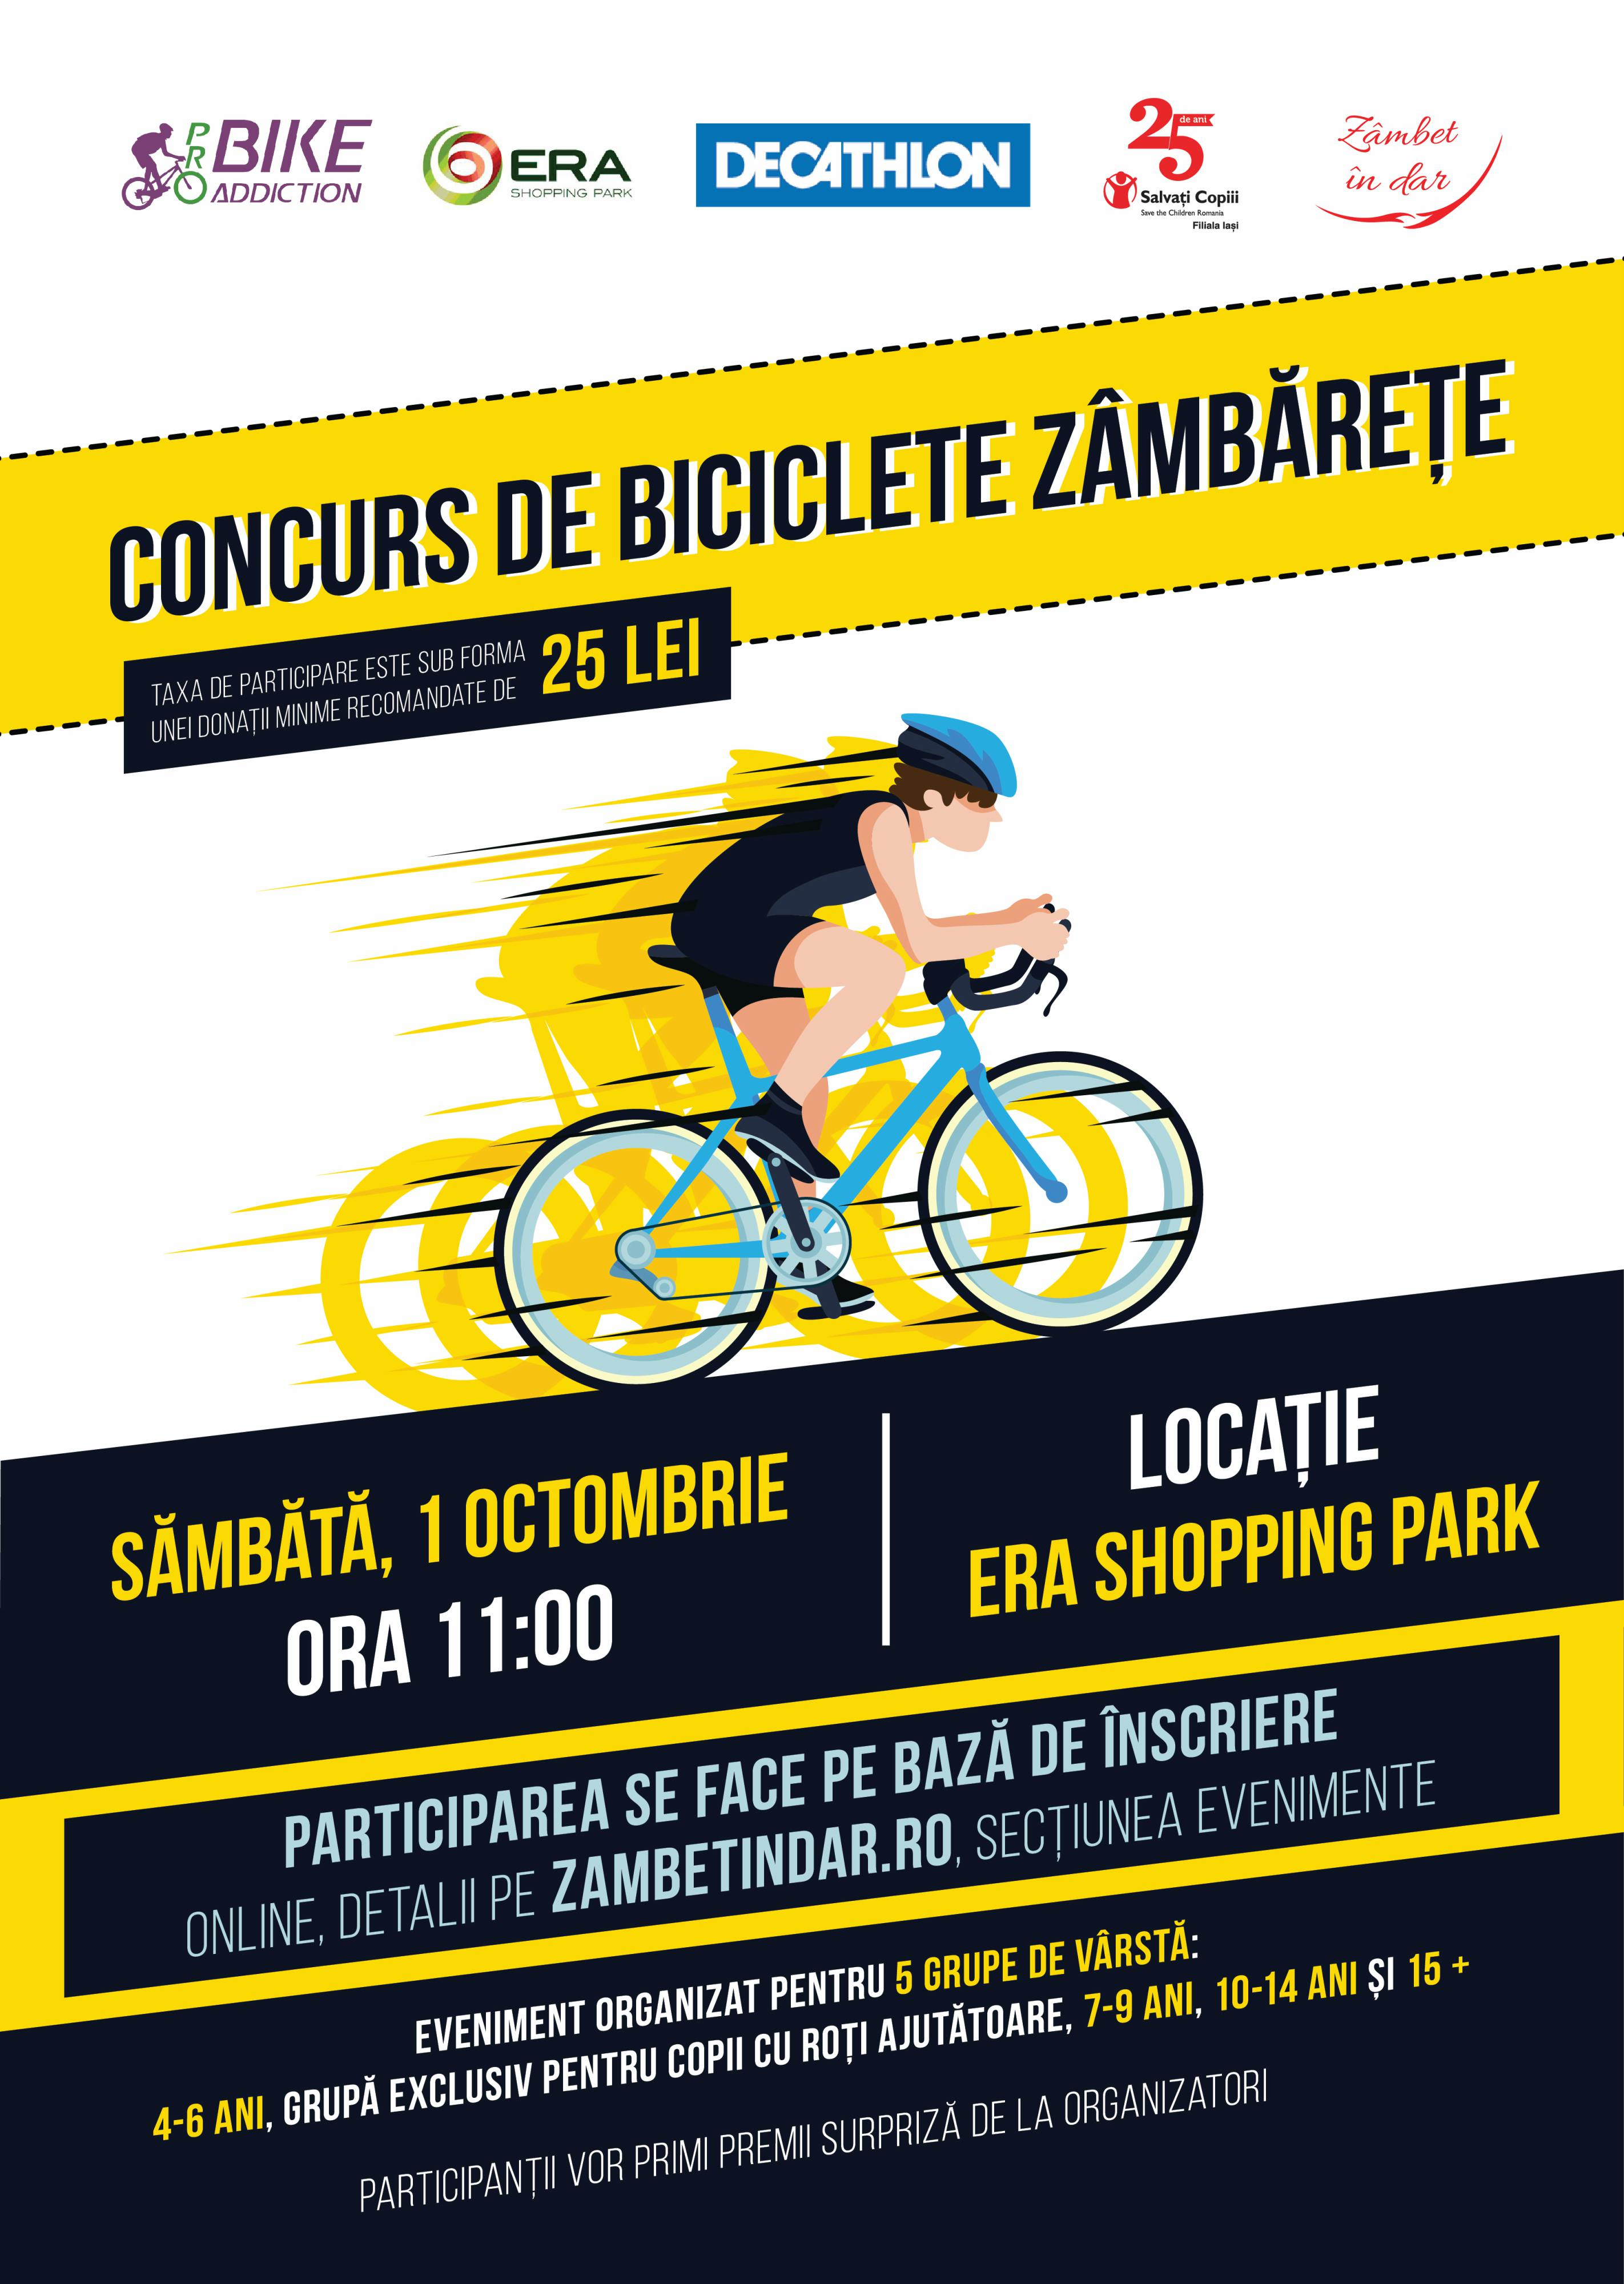 probikeaddiction salvat icopiii concurs biciclete